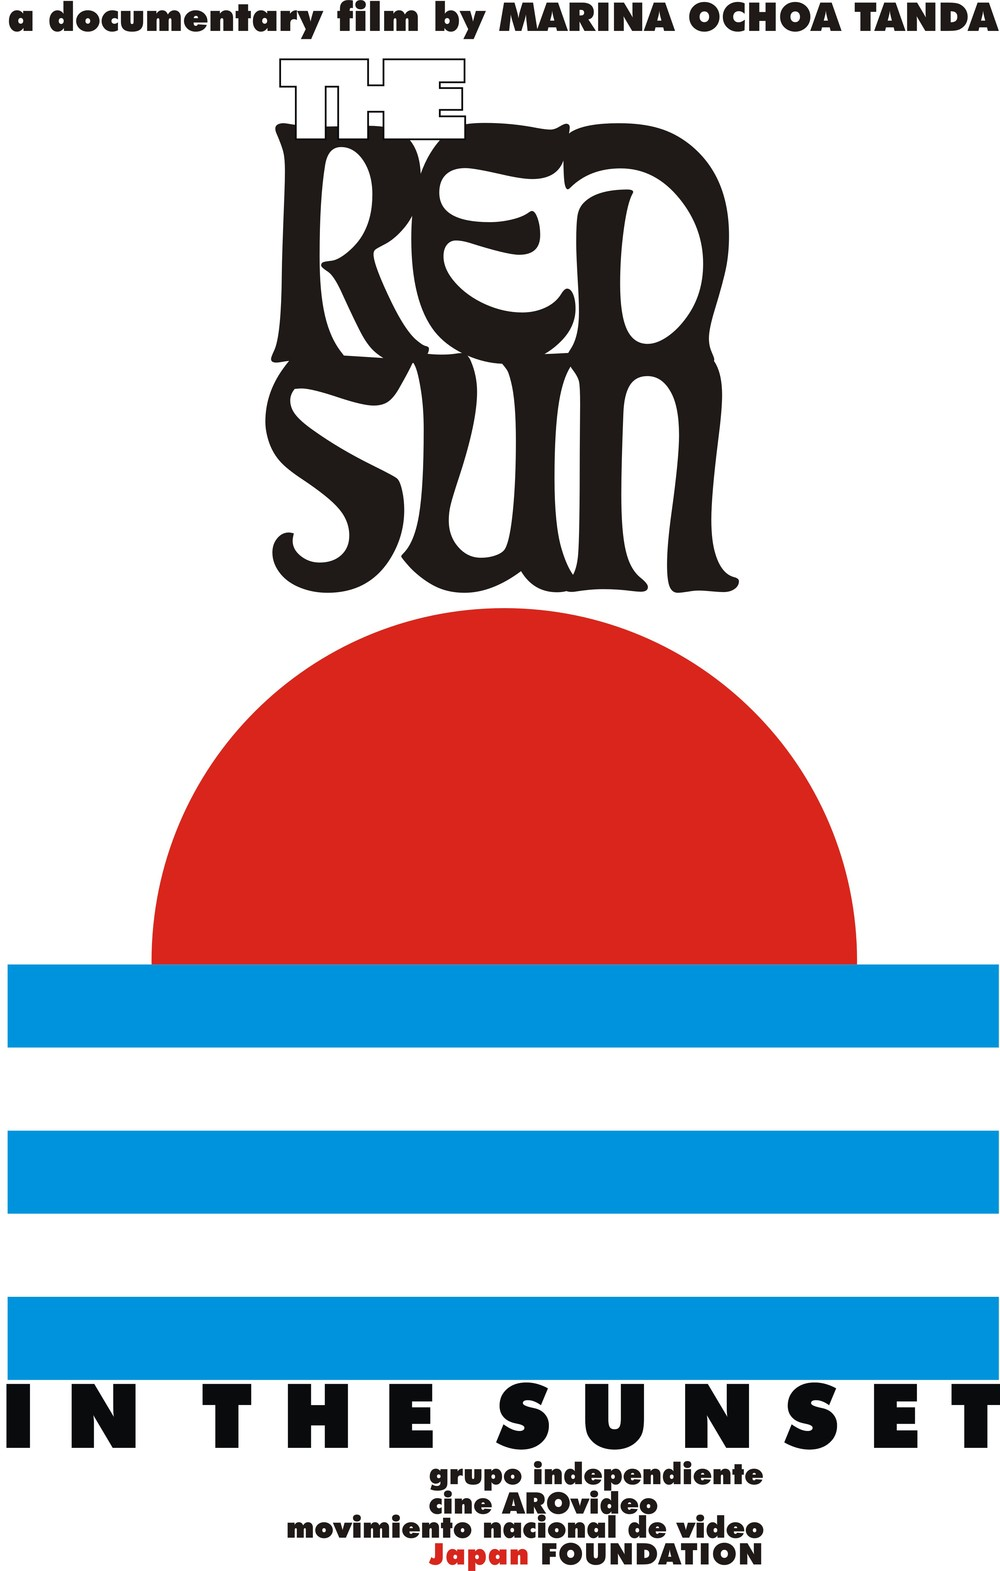 THE RED SUN_CARTEL.jpg